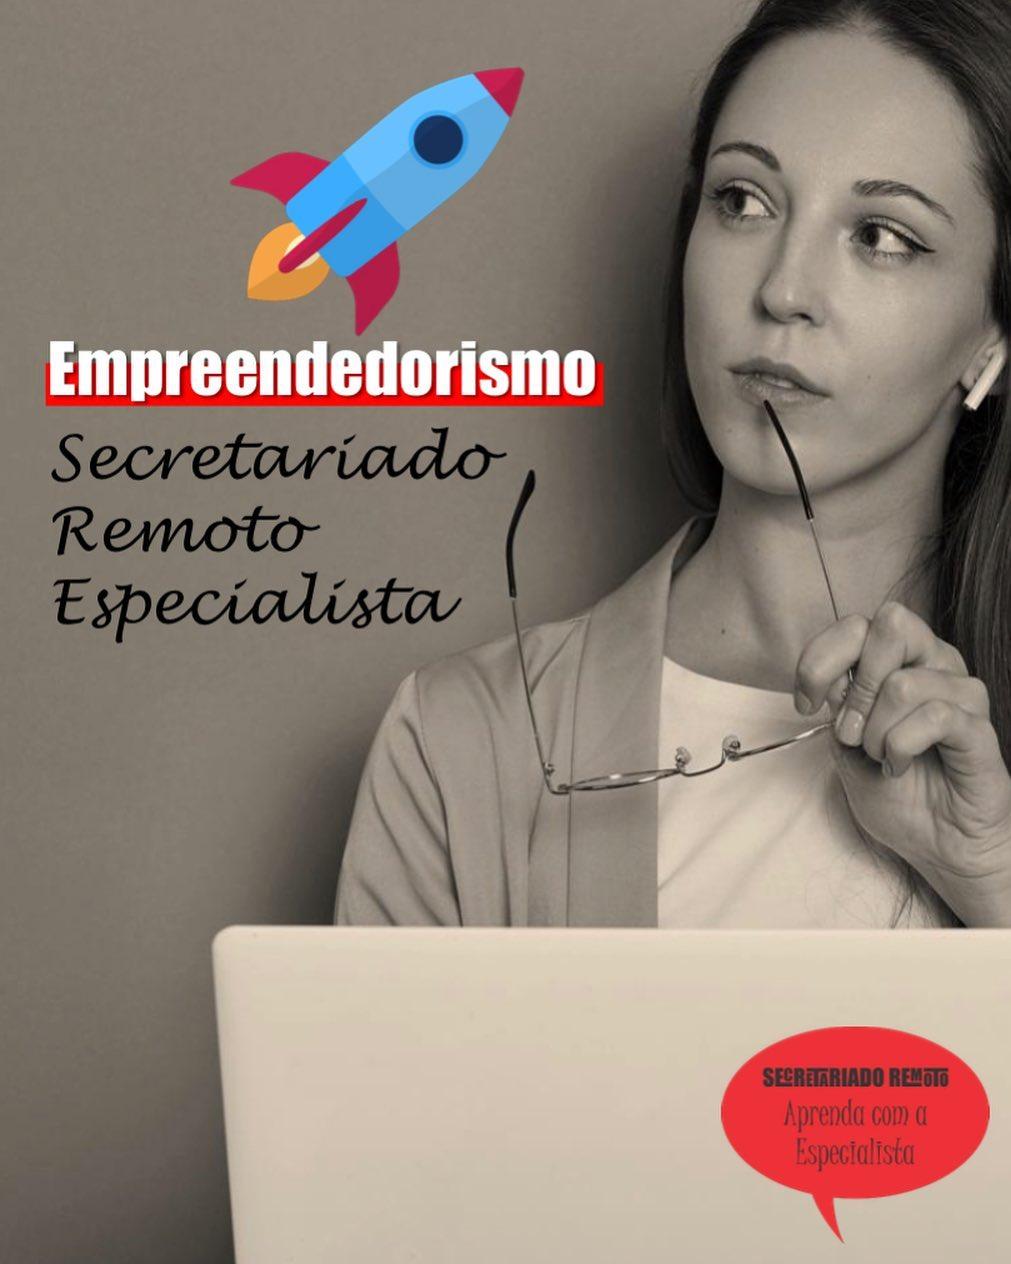 110015503 206493317409900 84181118207701803 n - Semana Mini Aula Secretariado Remoto - 1º Empreendedorismo